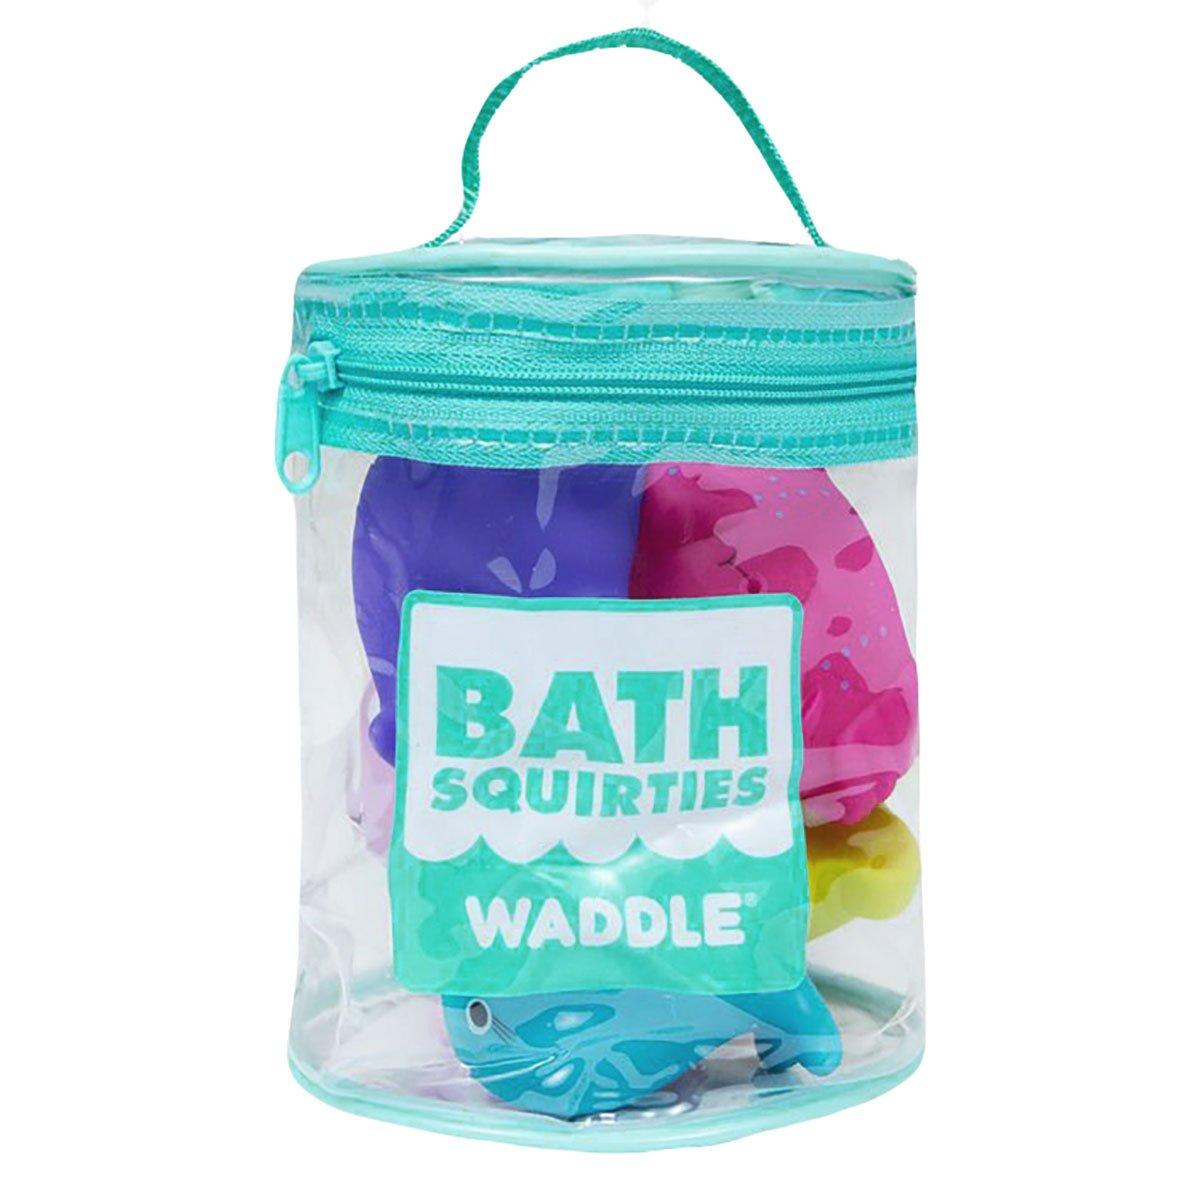 Waddle Transportation Bath Squirter Toys Boys Cars Trucks 6 Pack Bathtime Gift WAD-BATH-TRANSPORT